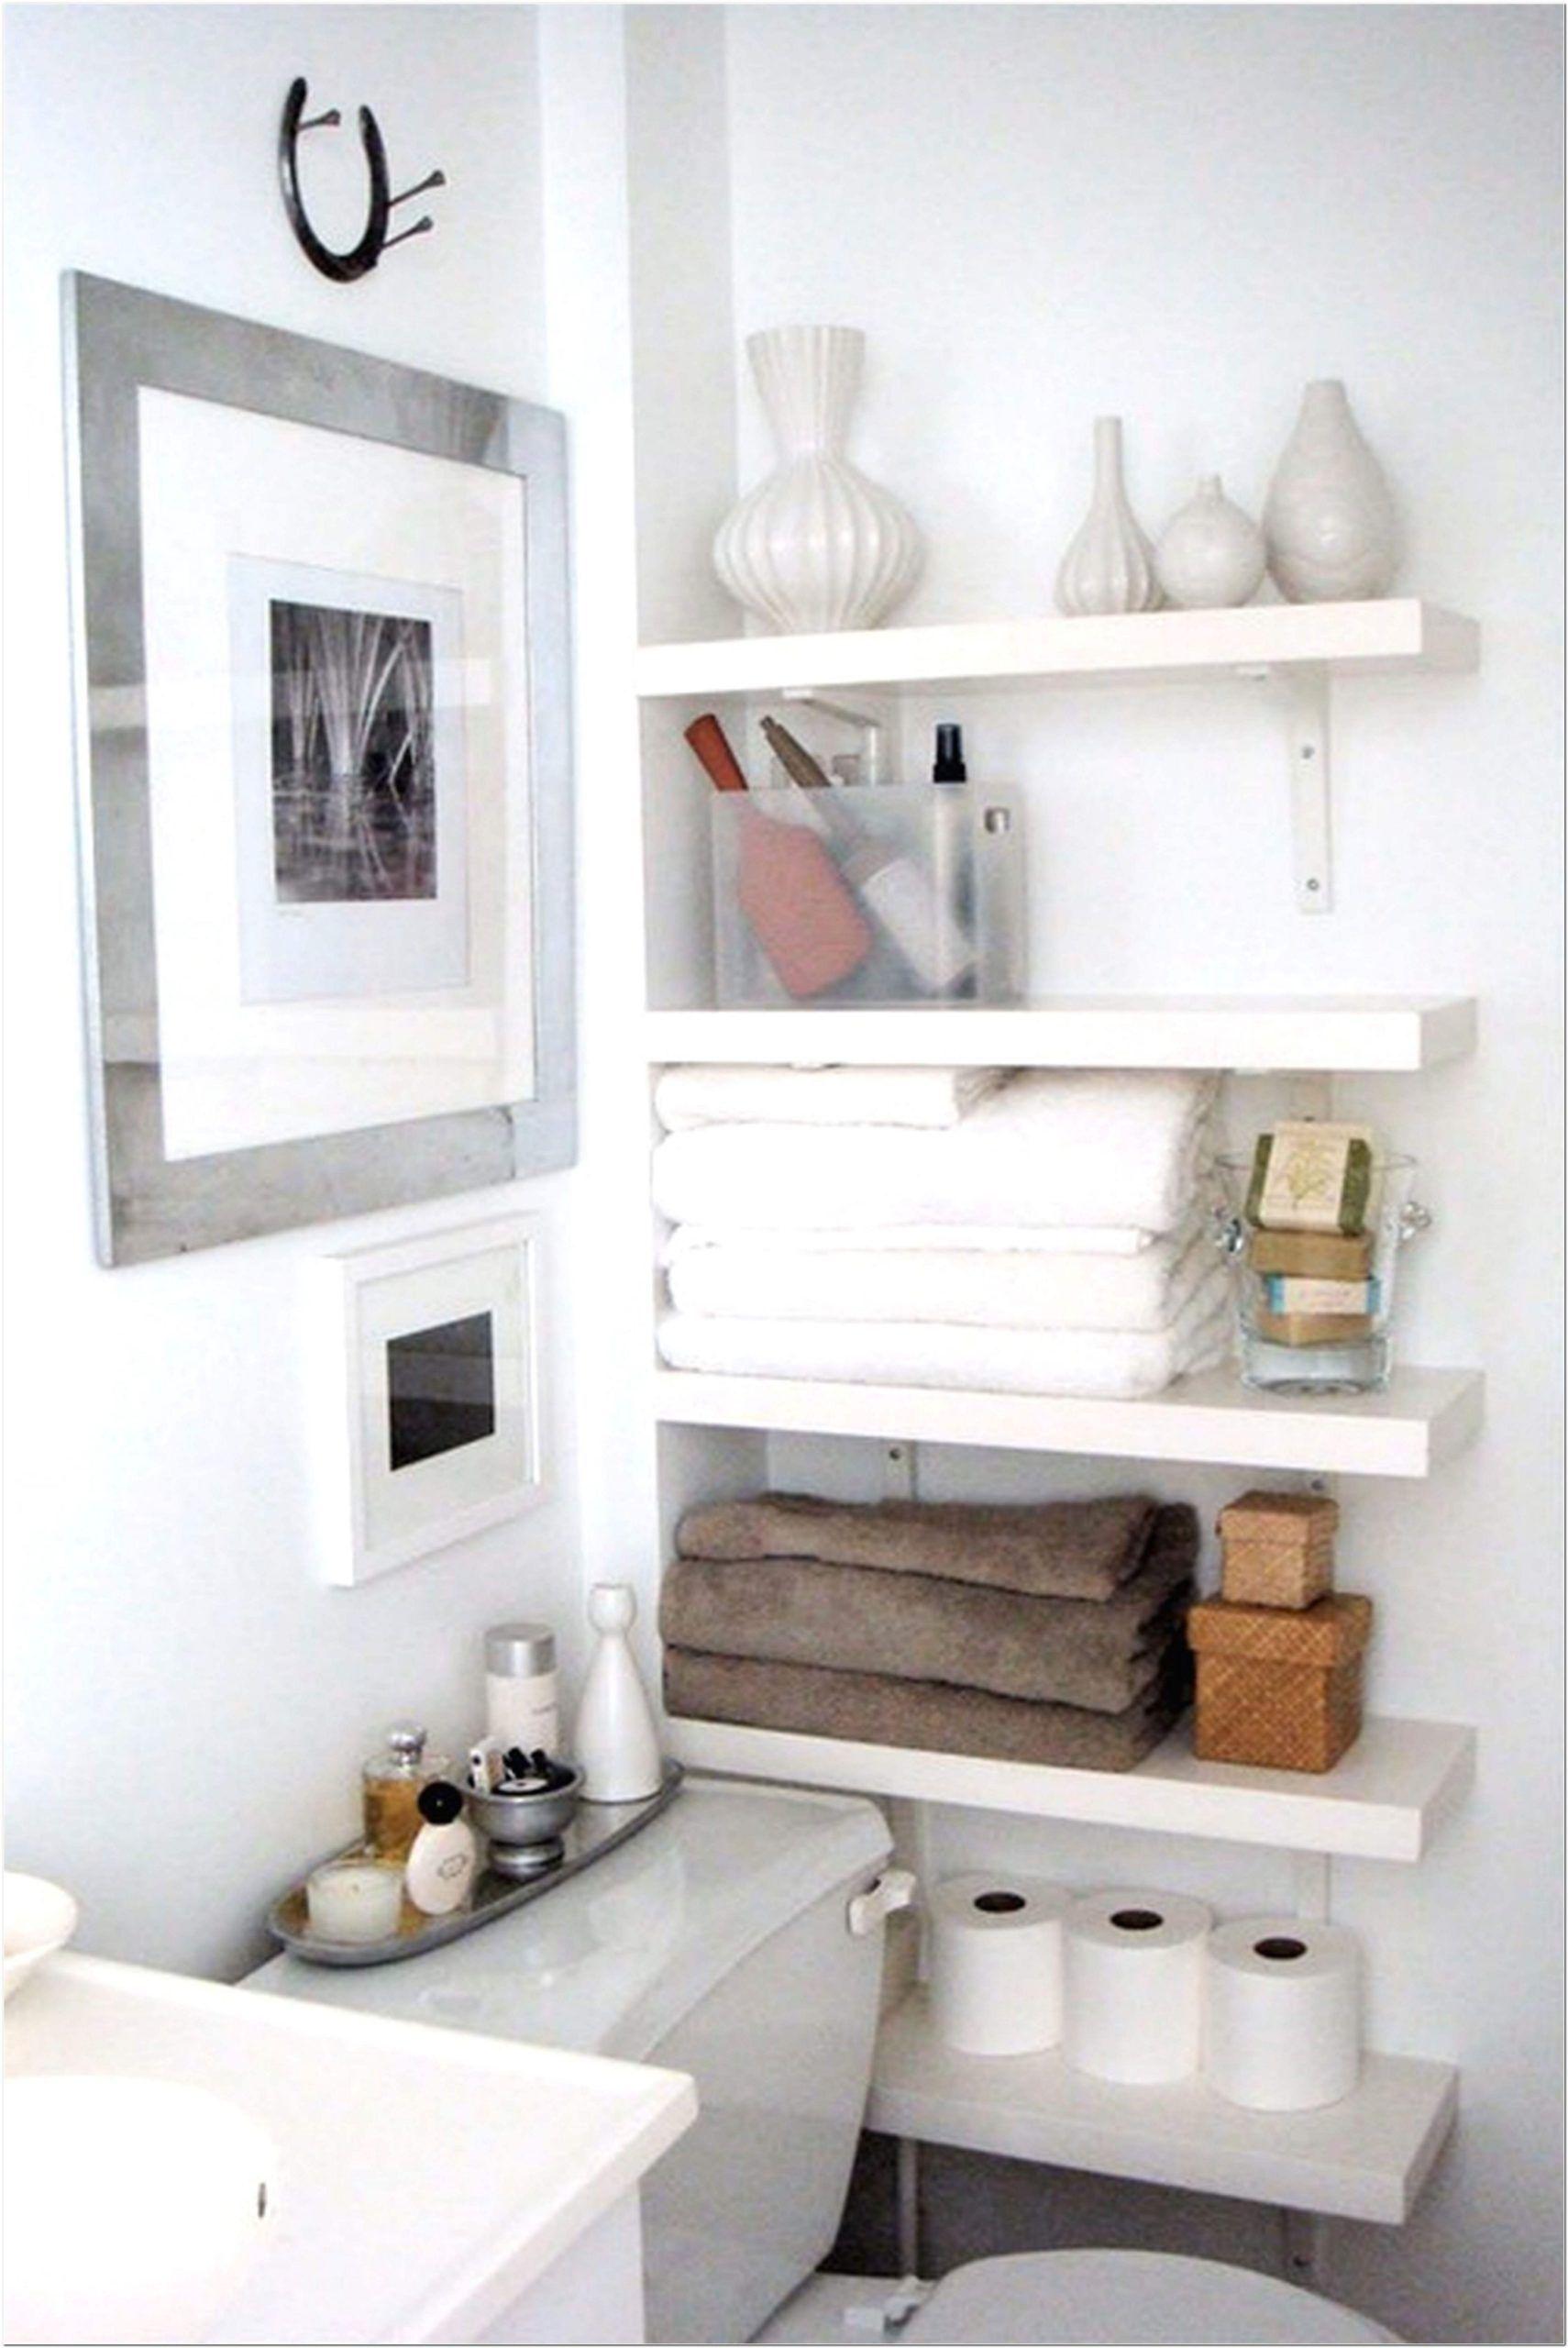 10 Adorable Small Bathroom Storage And Organization Ideas Bathroom Storage Solutions Ikea Small Spaces Small Bathroom Storage